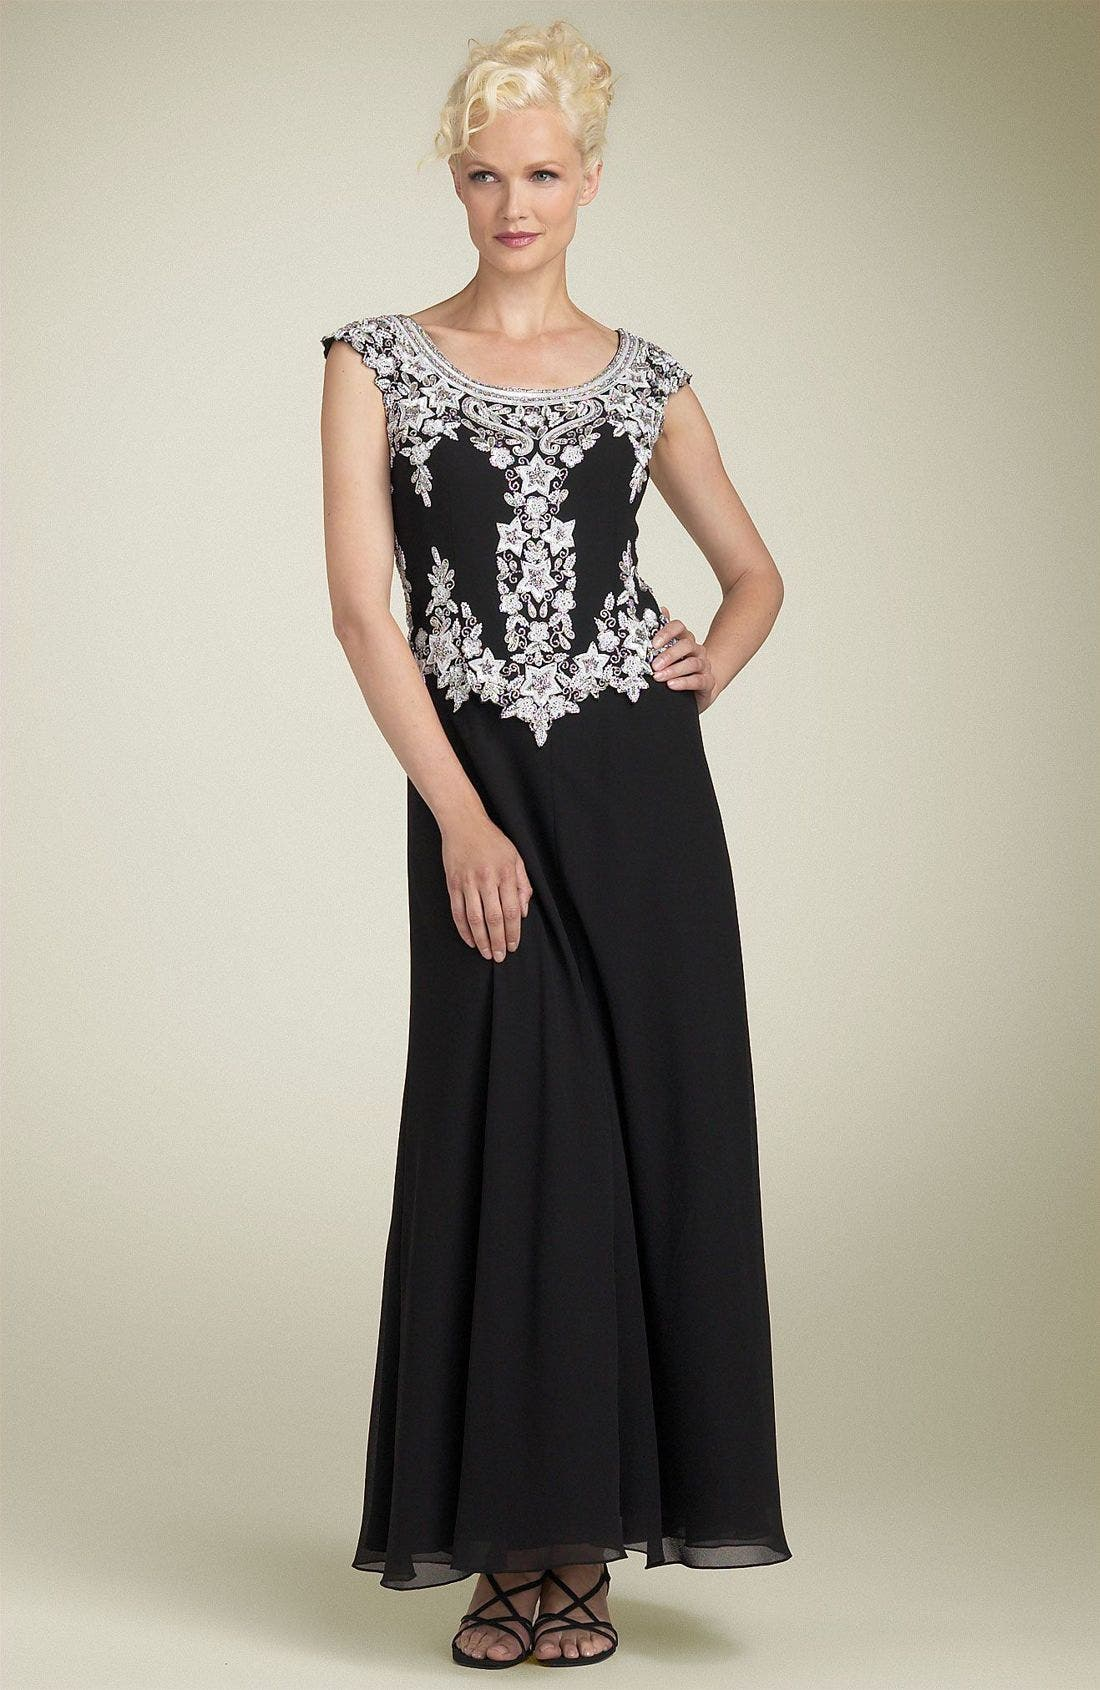 Alternate Image 1 Selected - J Kara Mock Two Piece Scalloped Dress